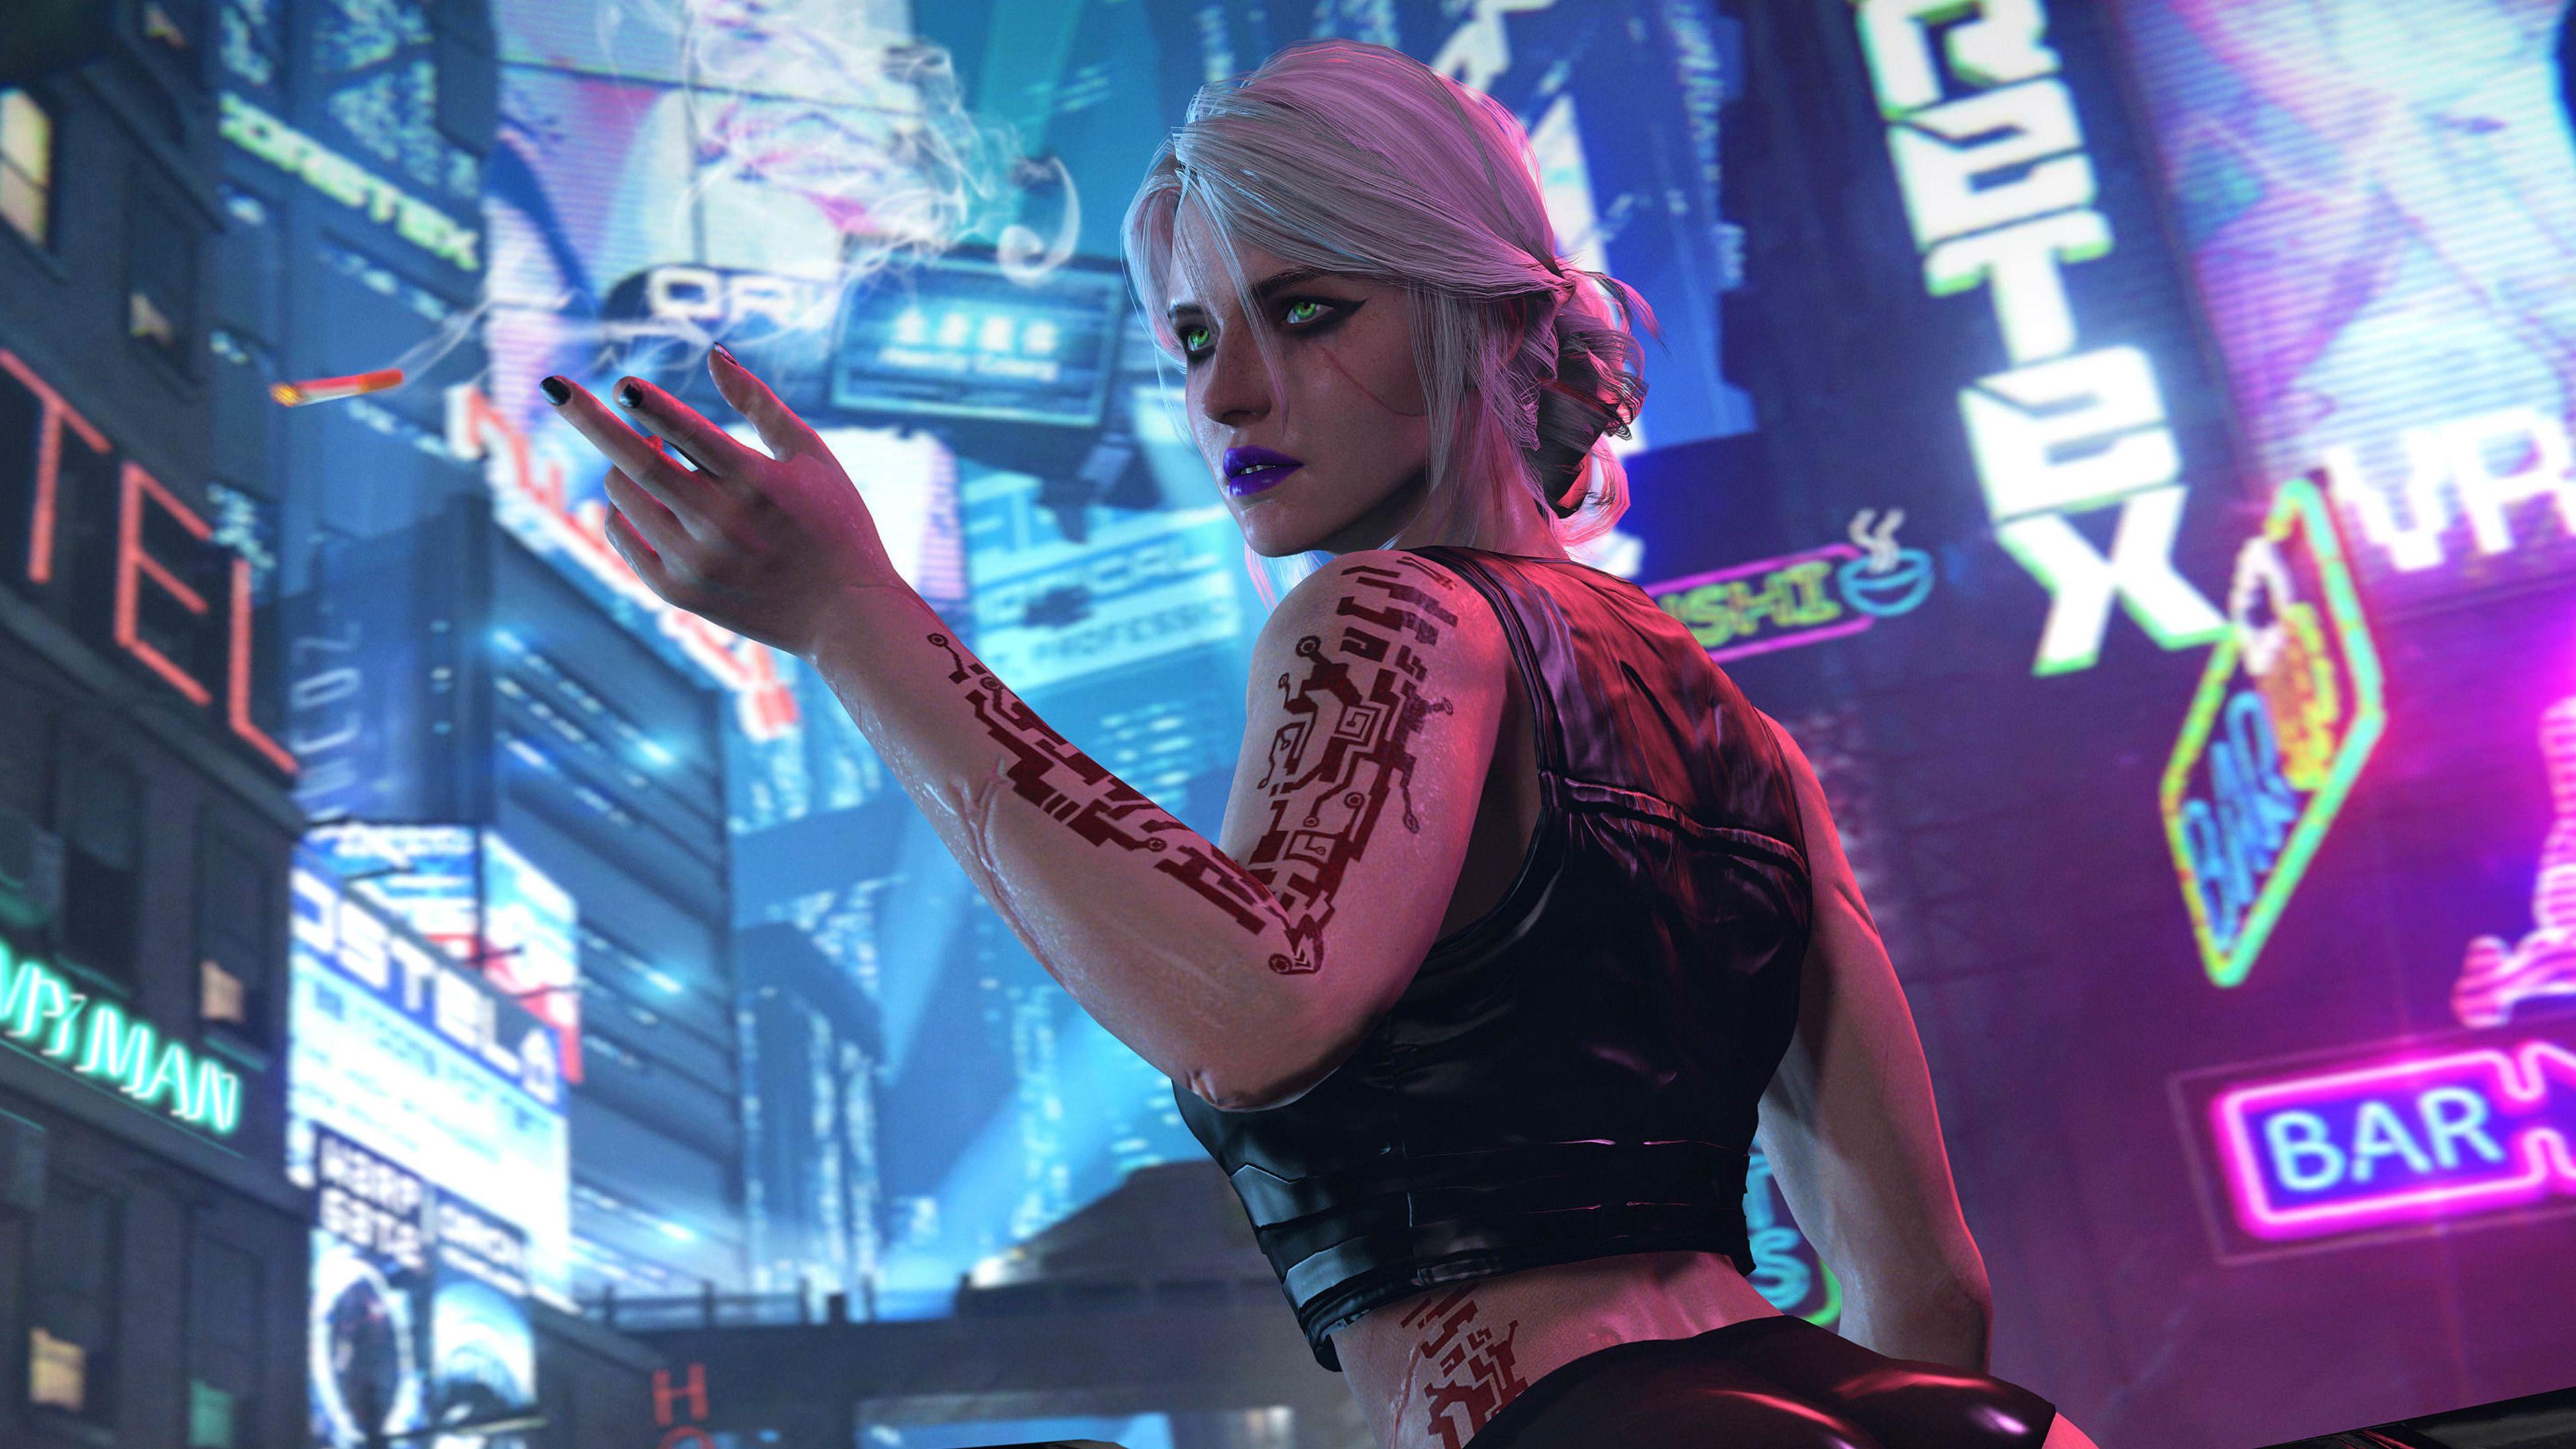 Ciri Cyberpunk 2077 4k Xbox Games Wallpapers Scifi Wallpapers Ps Games Wallpapers Pc Games Wallpapers Neon Wal Pc Games Wallpapers Cyberpunk 2077 Cyberpunk